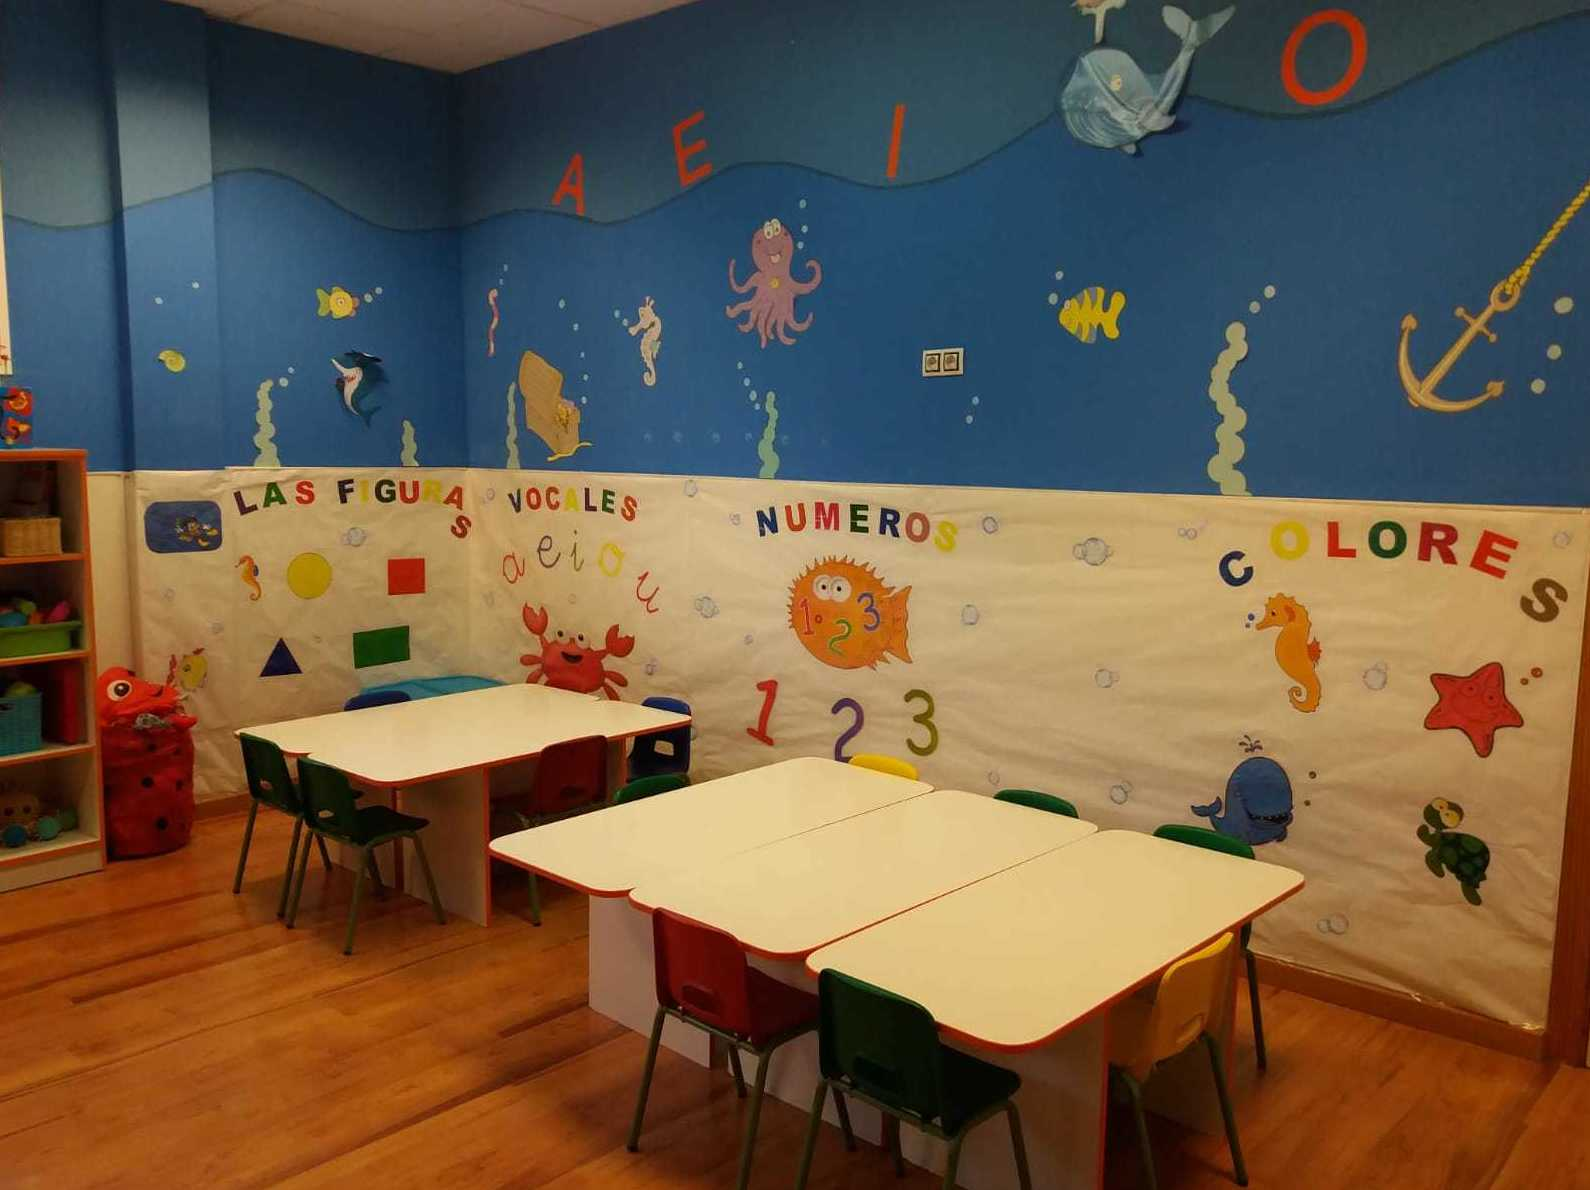 escuela infantil Valdemoro